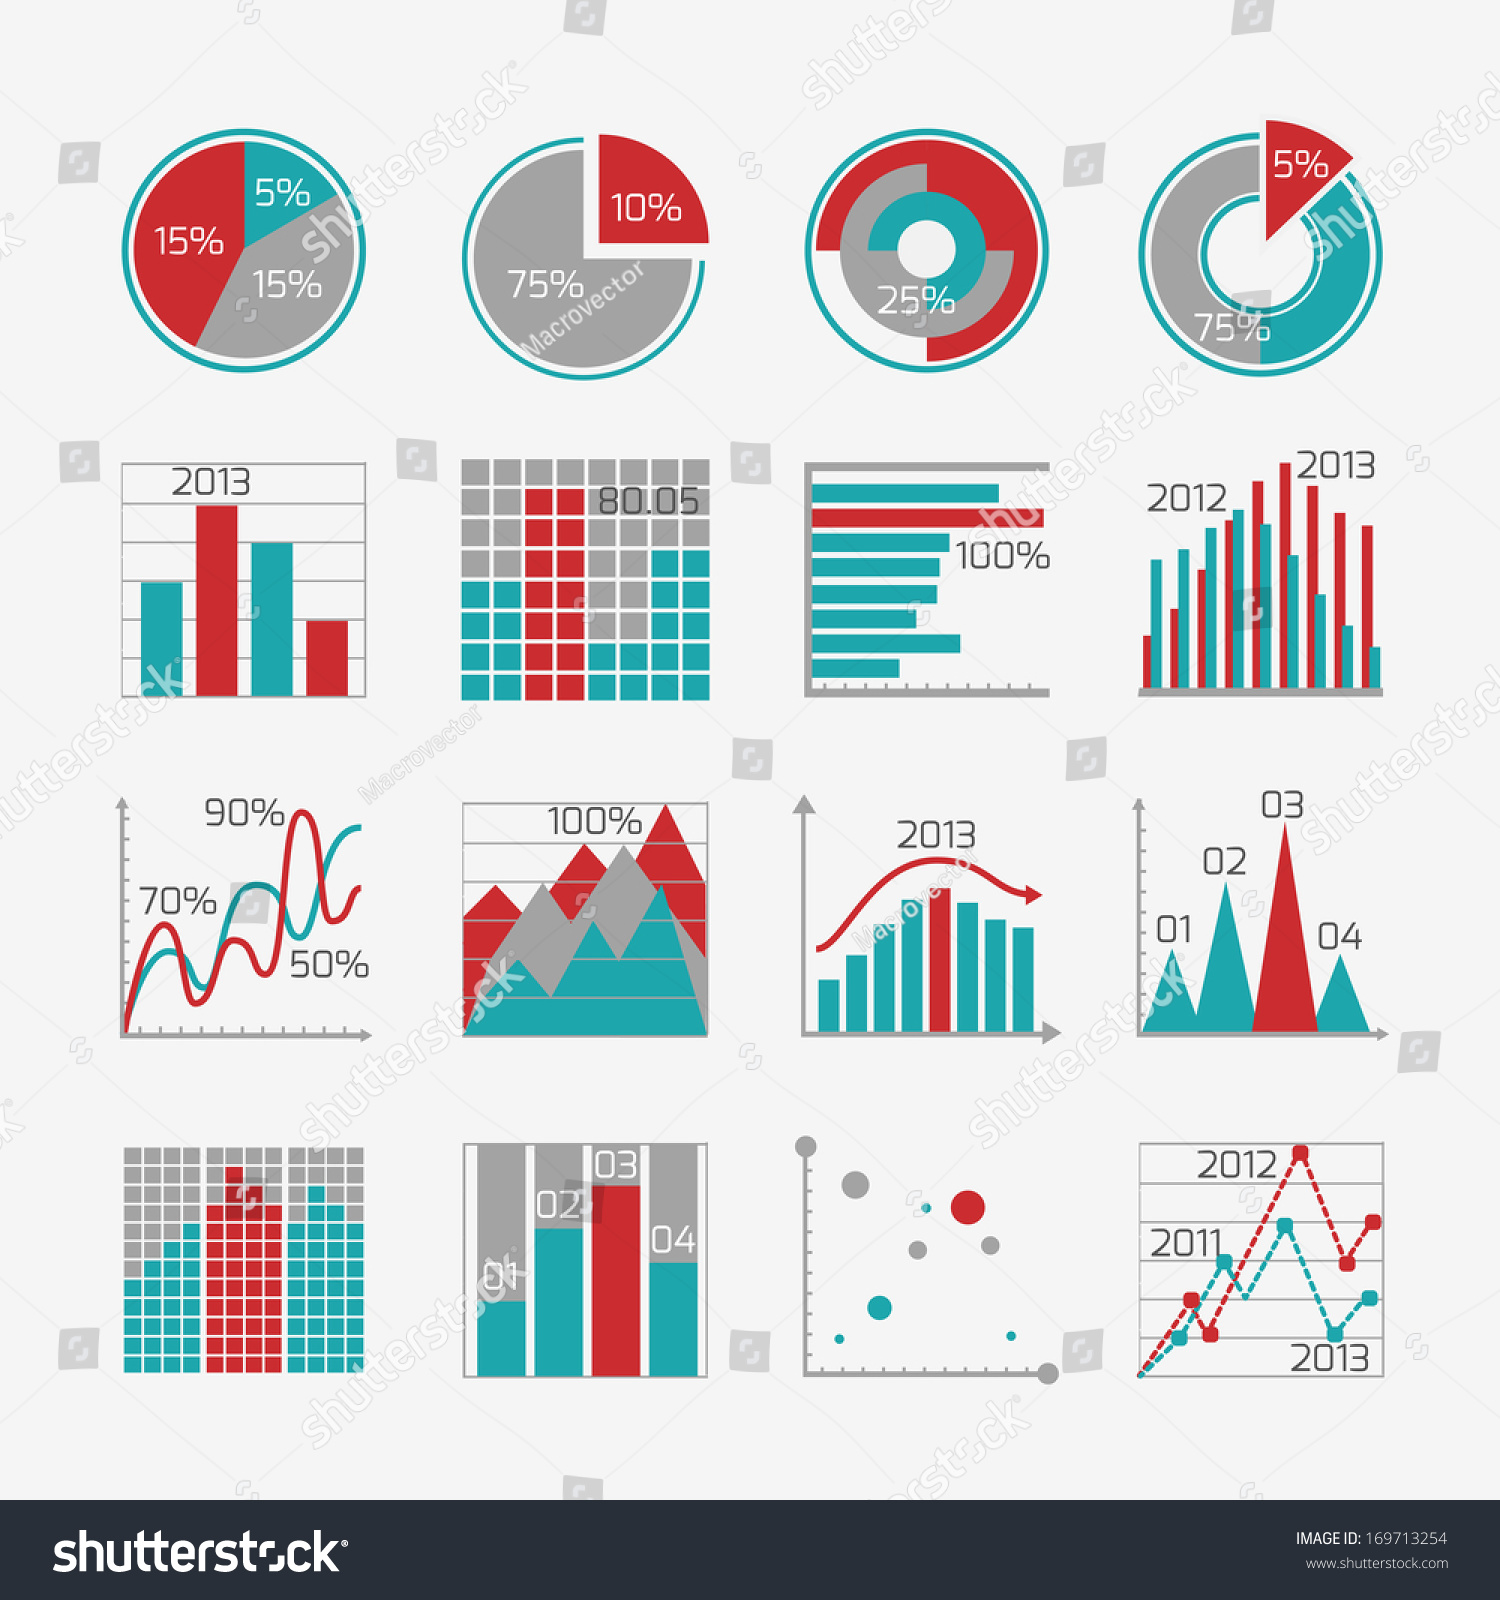 infographic elements business report presentation website stock